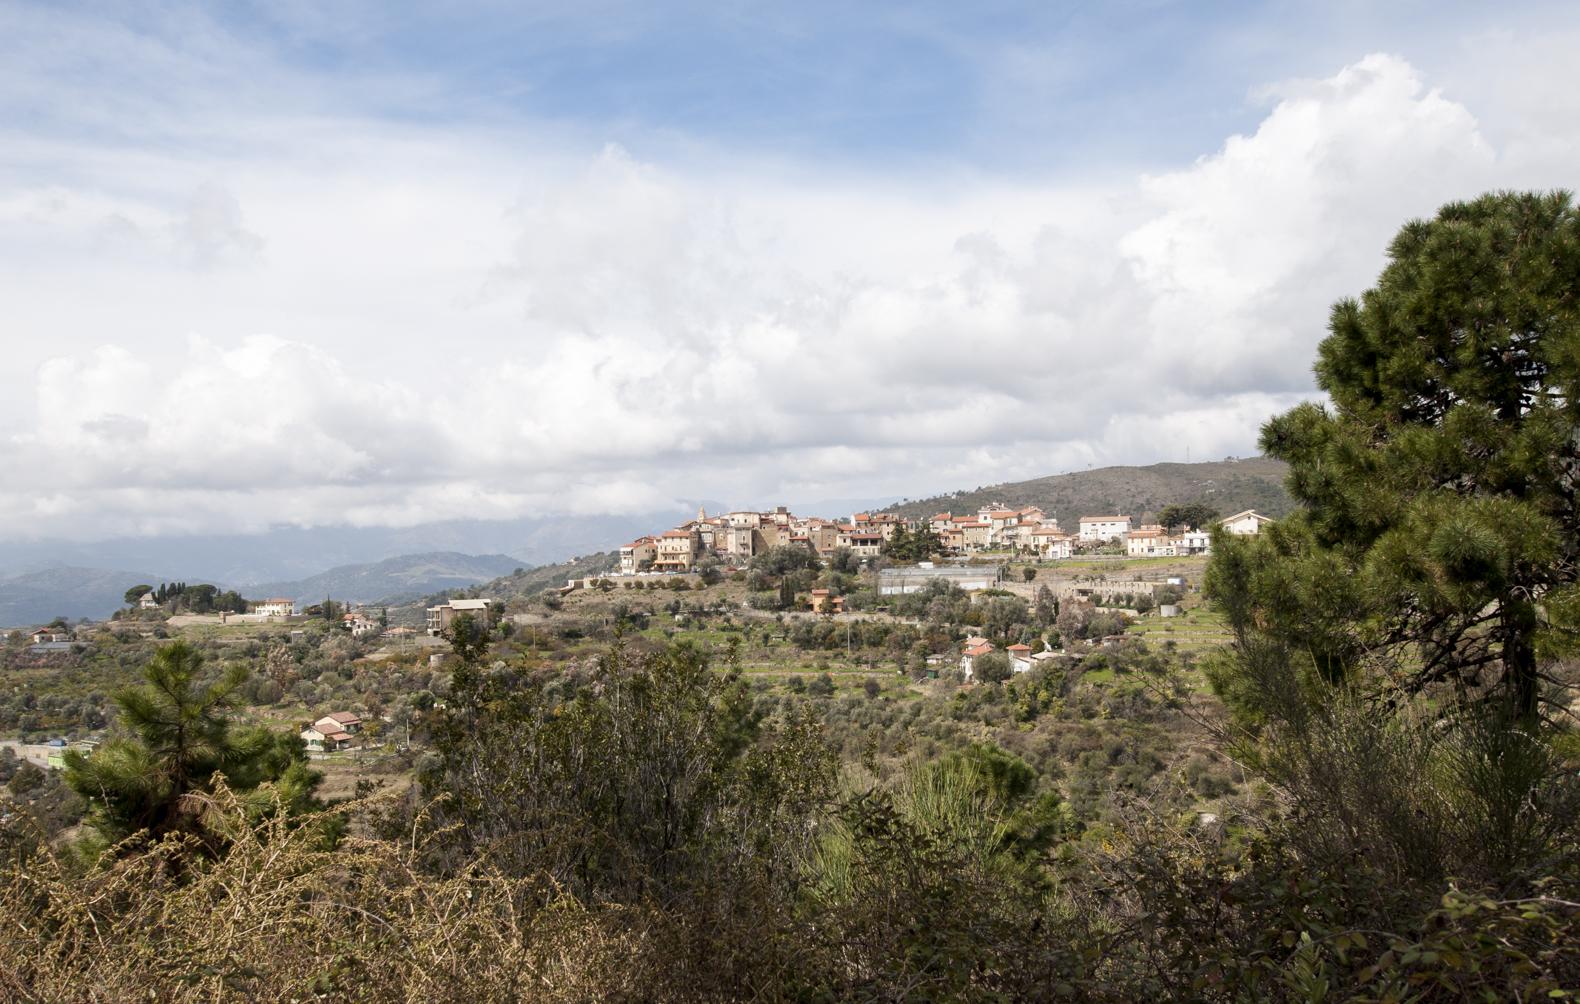 Bordighera-Sanremo